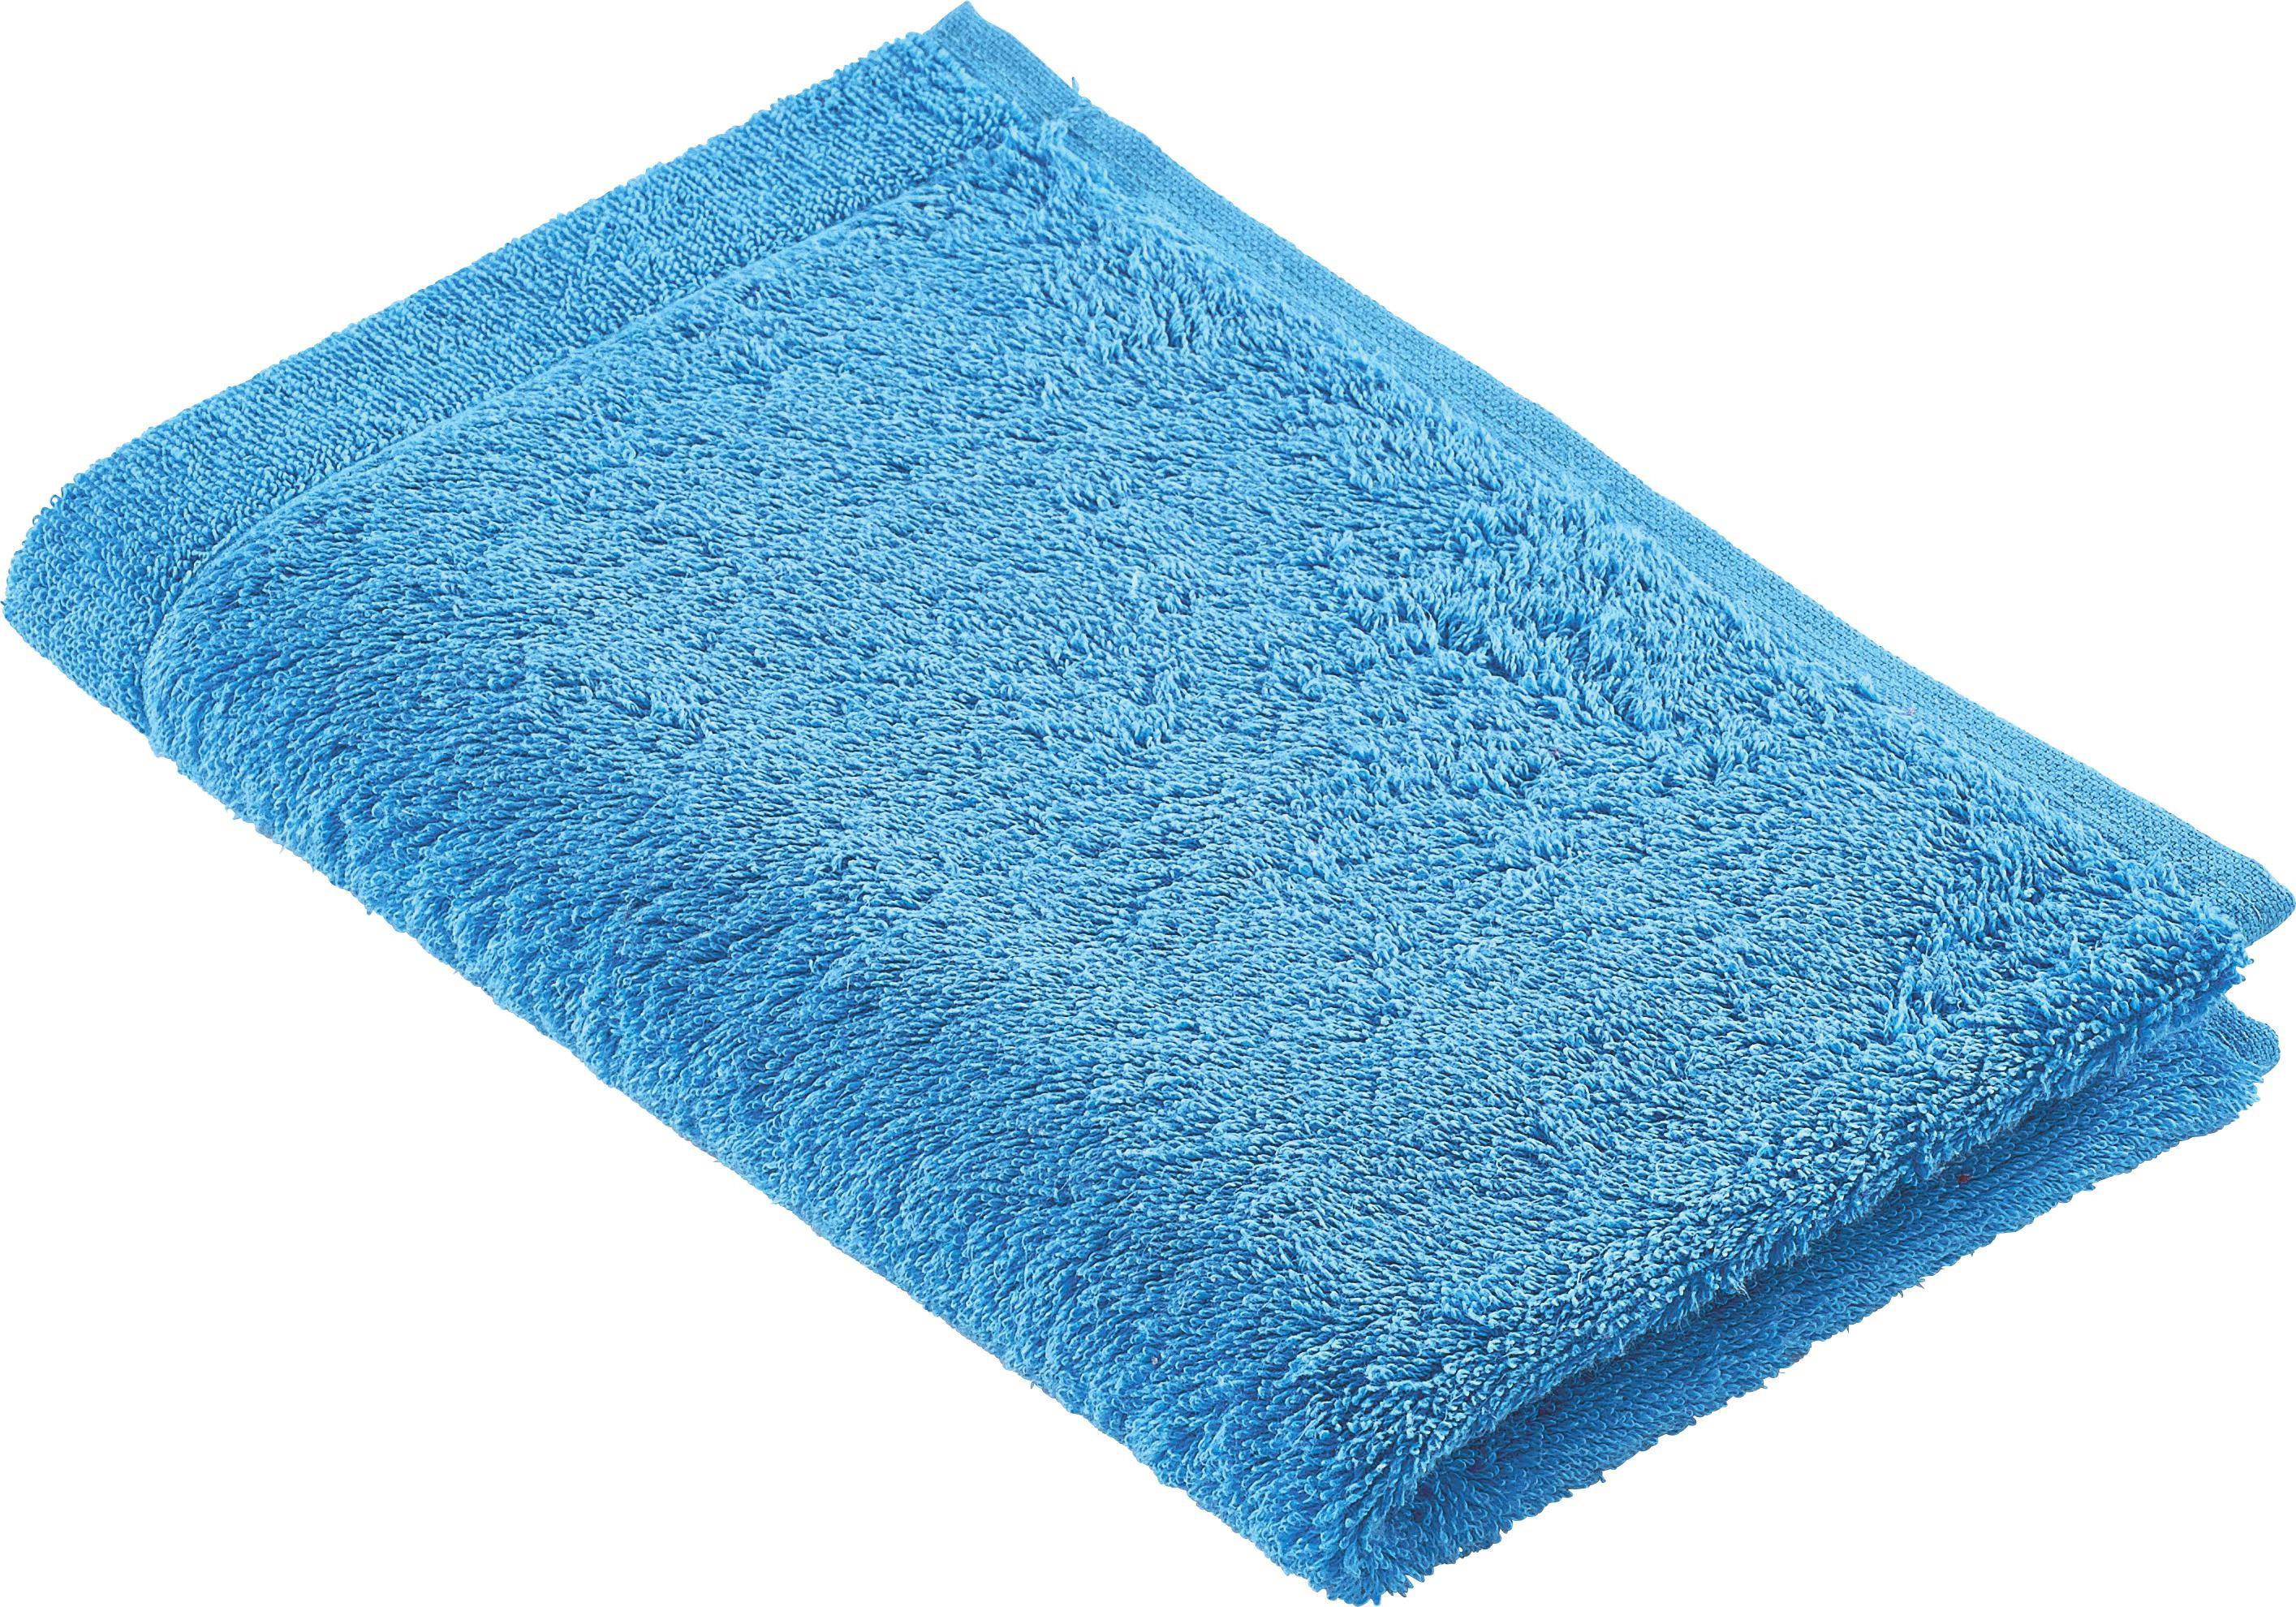 GÄSTETUCH 30/50 cm - Blau, Basics, Textil (30/50cm) - CAWOE